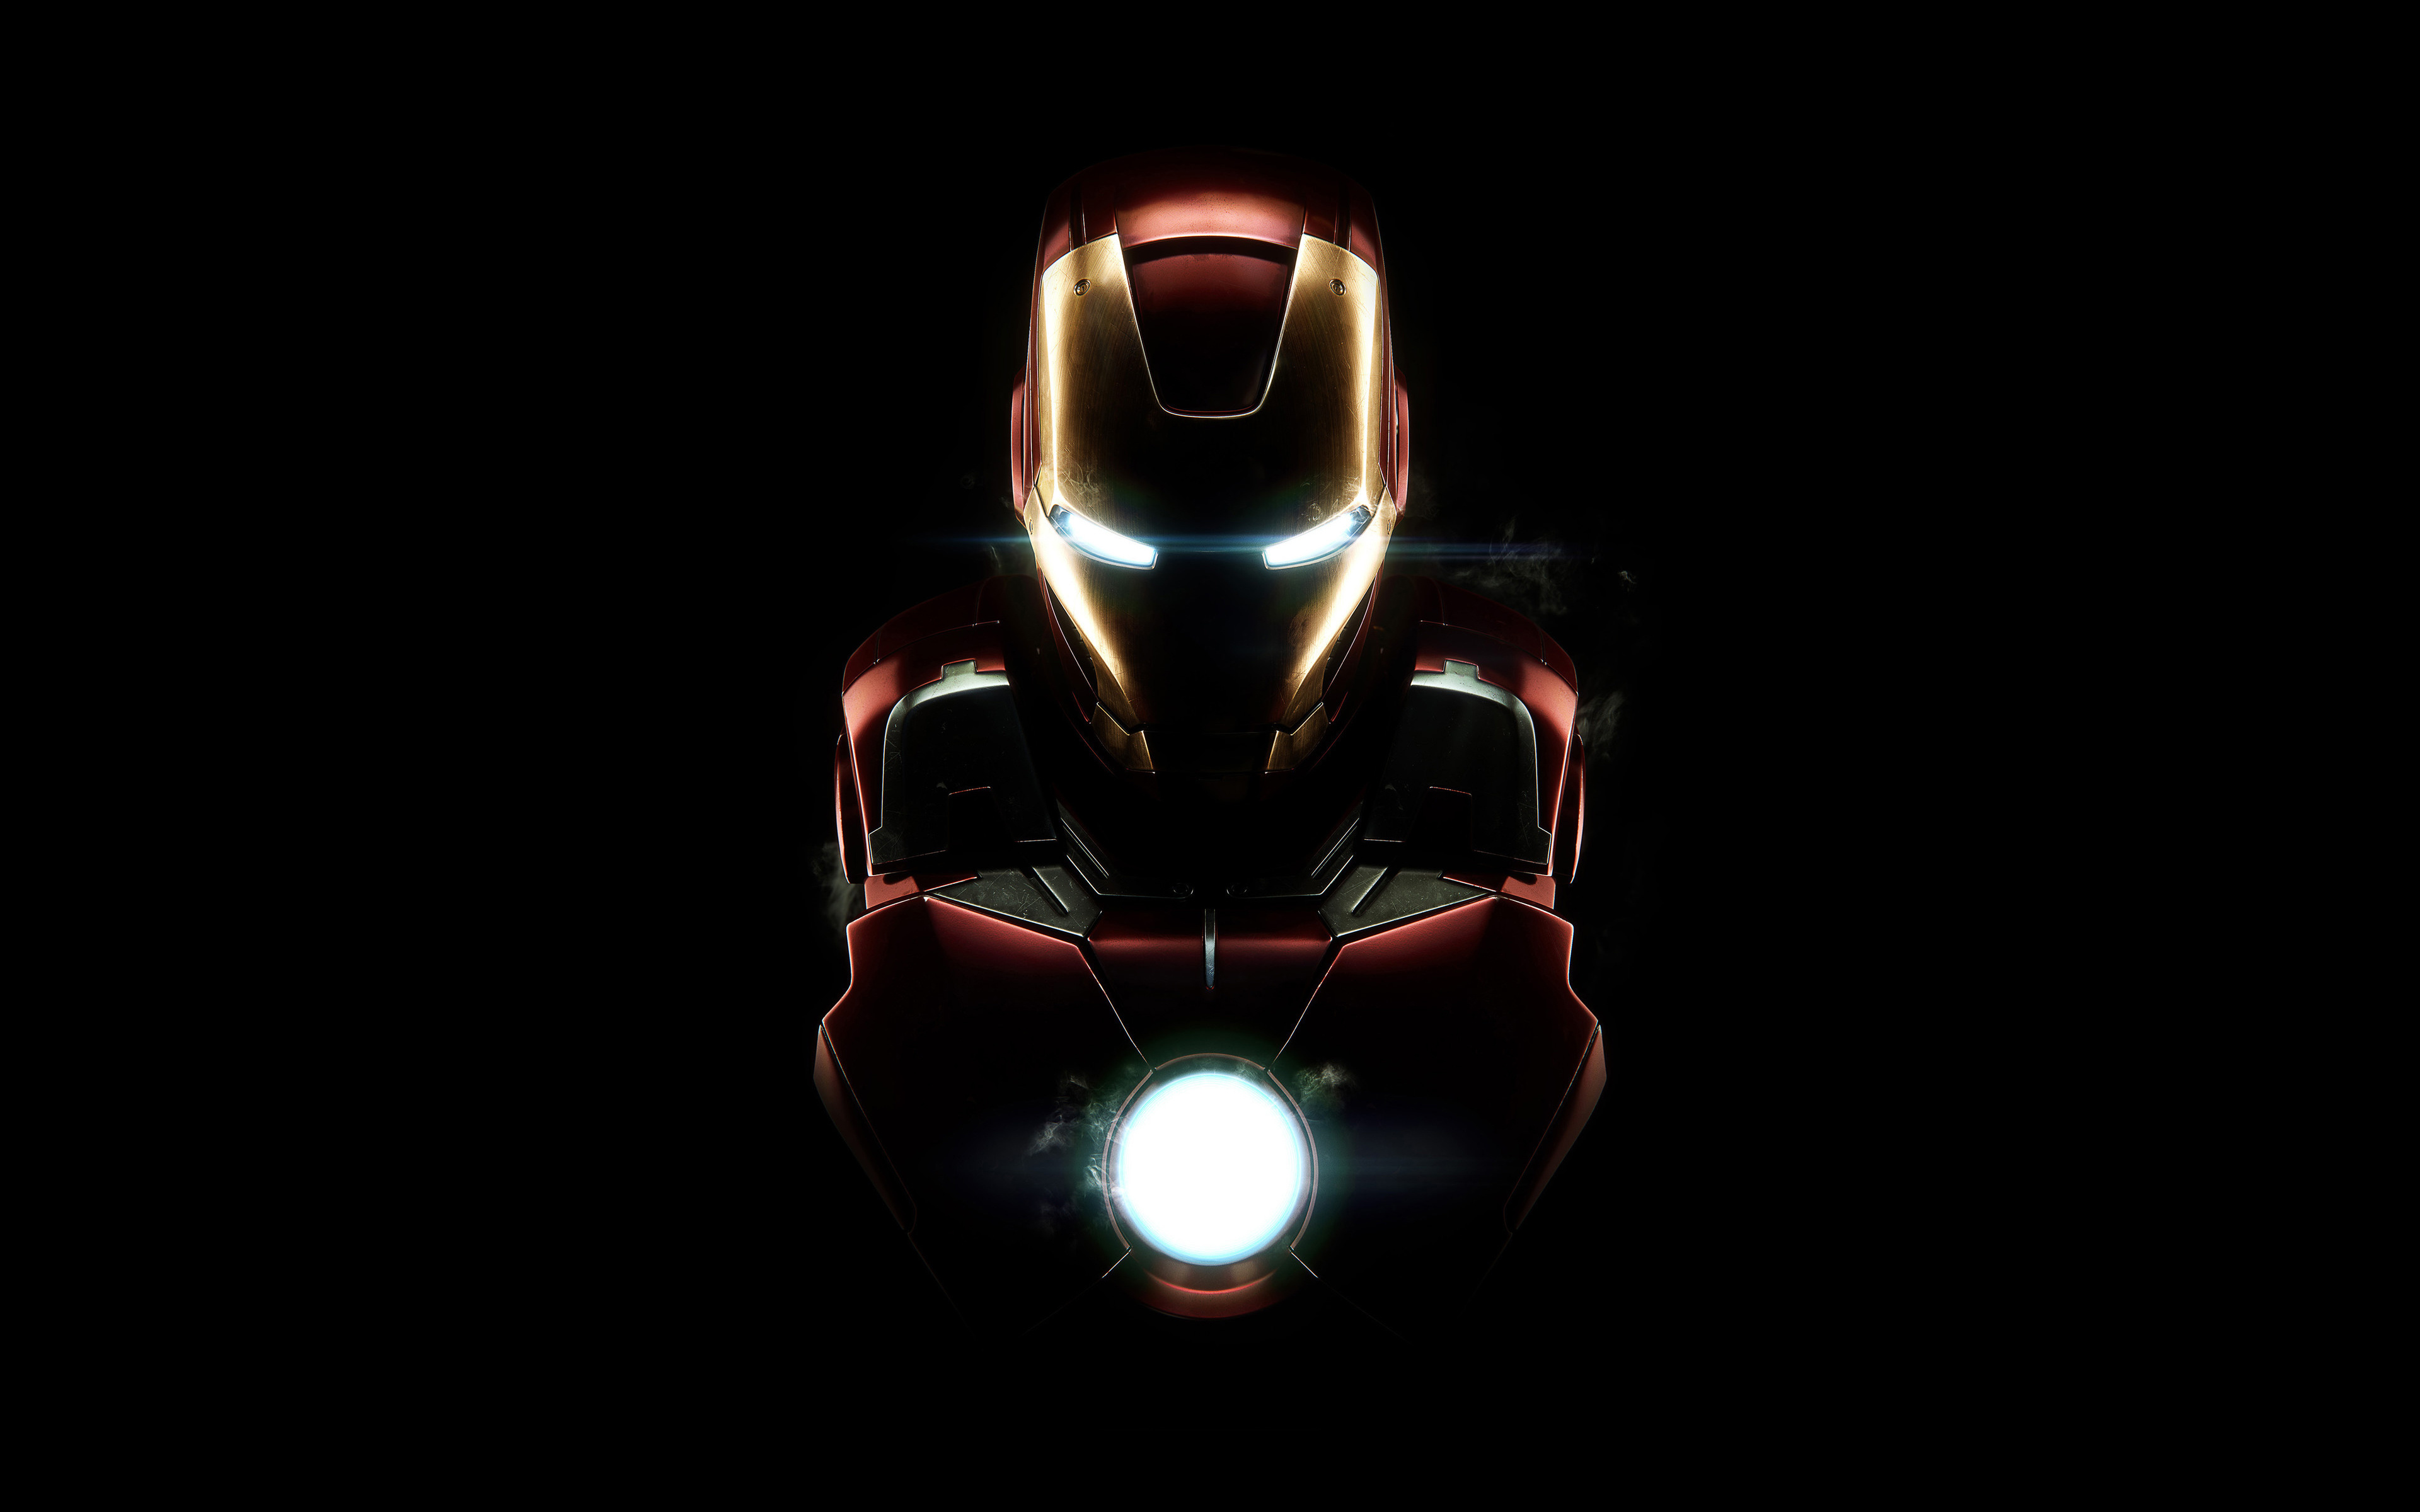 Download 3840x2400 Wallpaper Iron Man Dark Armor Mark Vii 4k Ultra Hd 16 10 Widescreen 3840x2400 Hd Image Background 7422